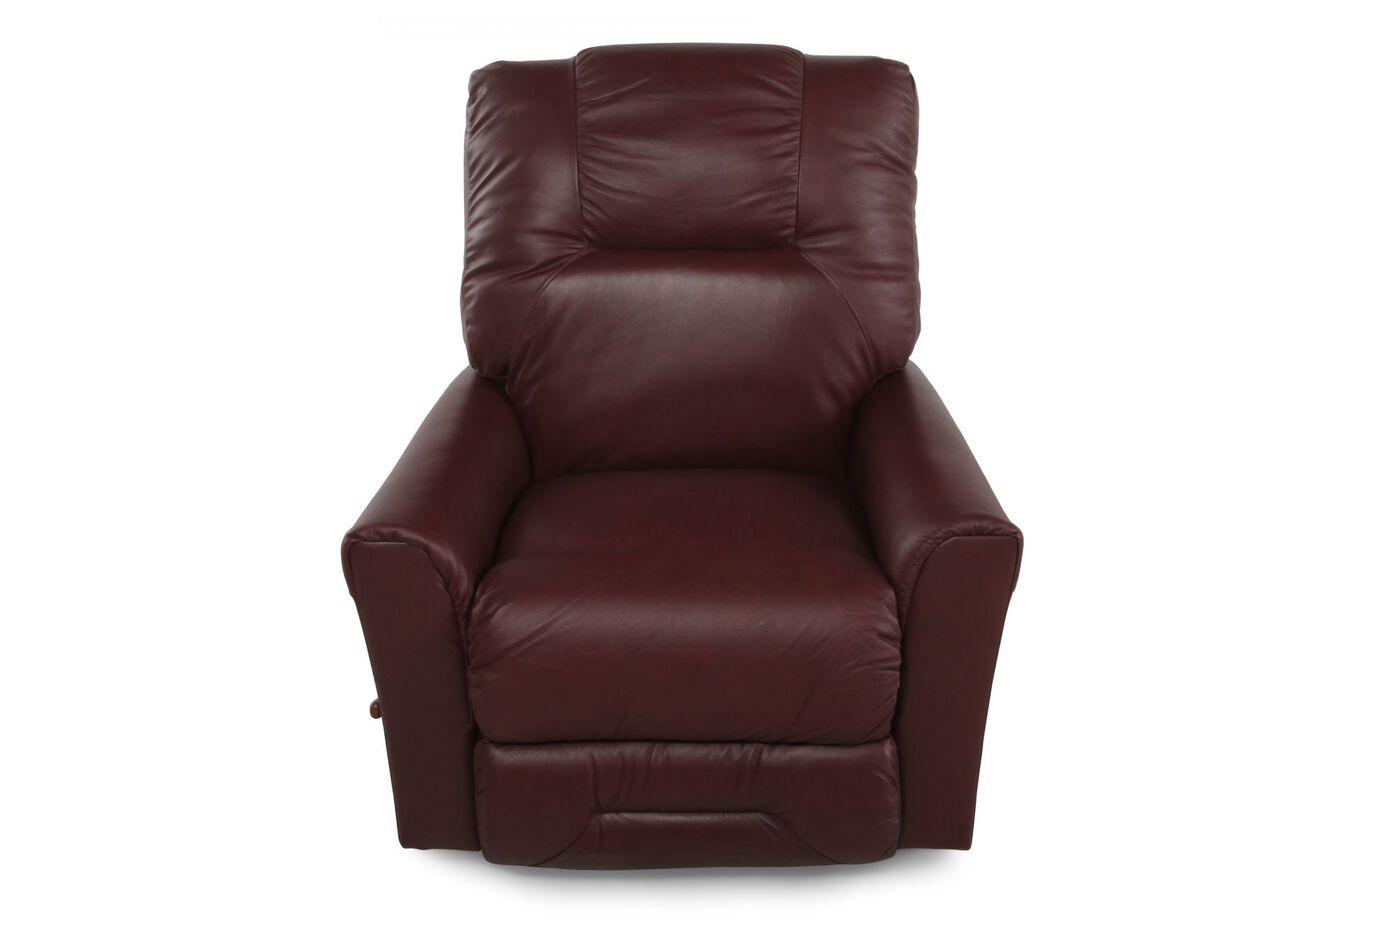 La Z Boy Easton Burgundy Recliner Mathis Brothers Furniture